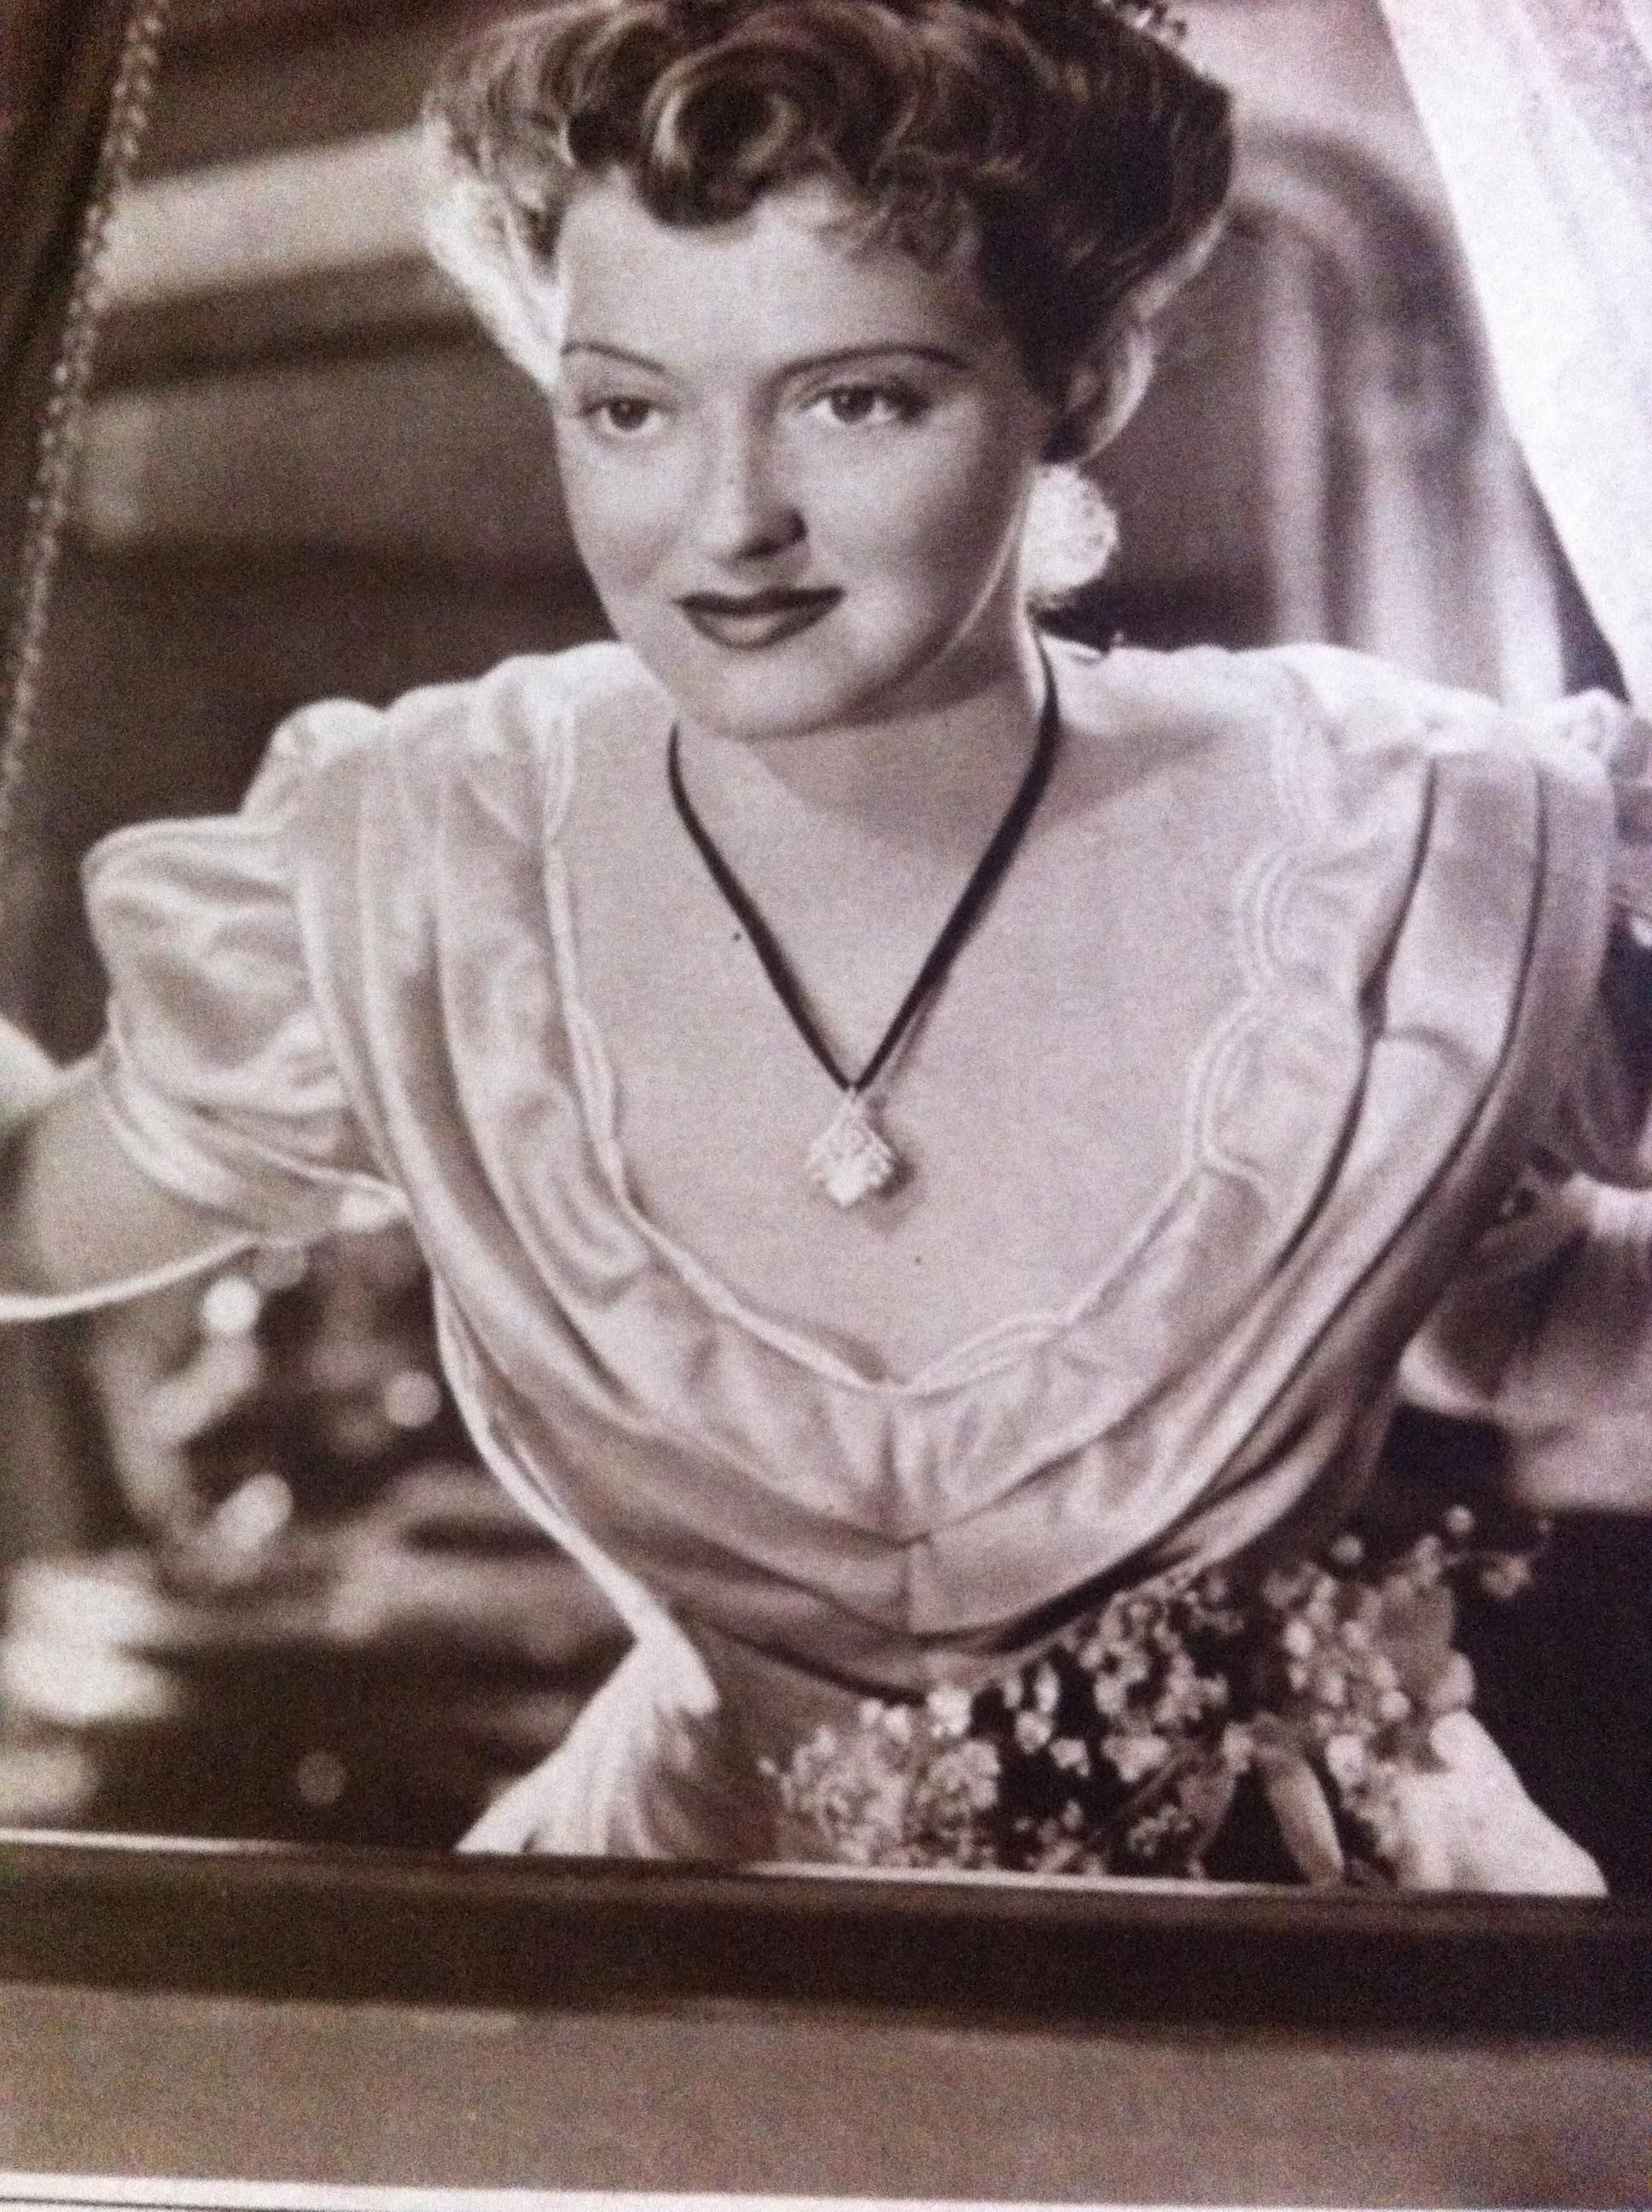 Bette Davis in The Sisters (1938)